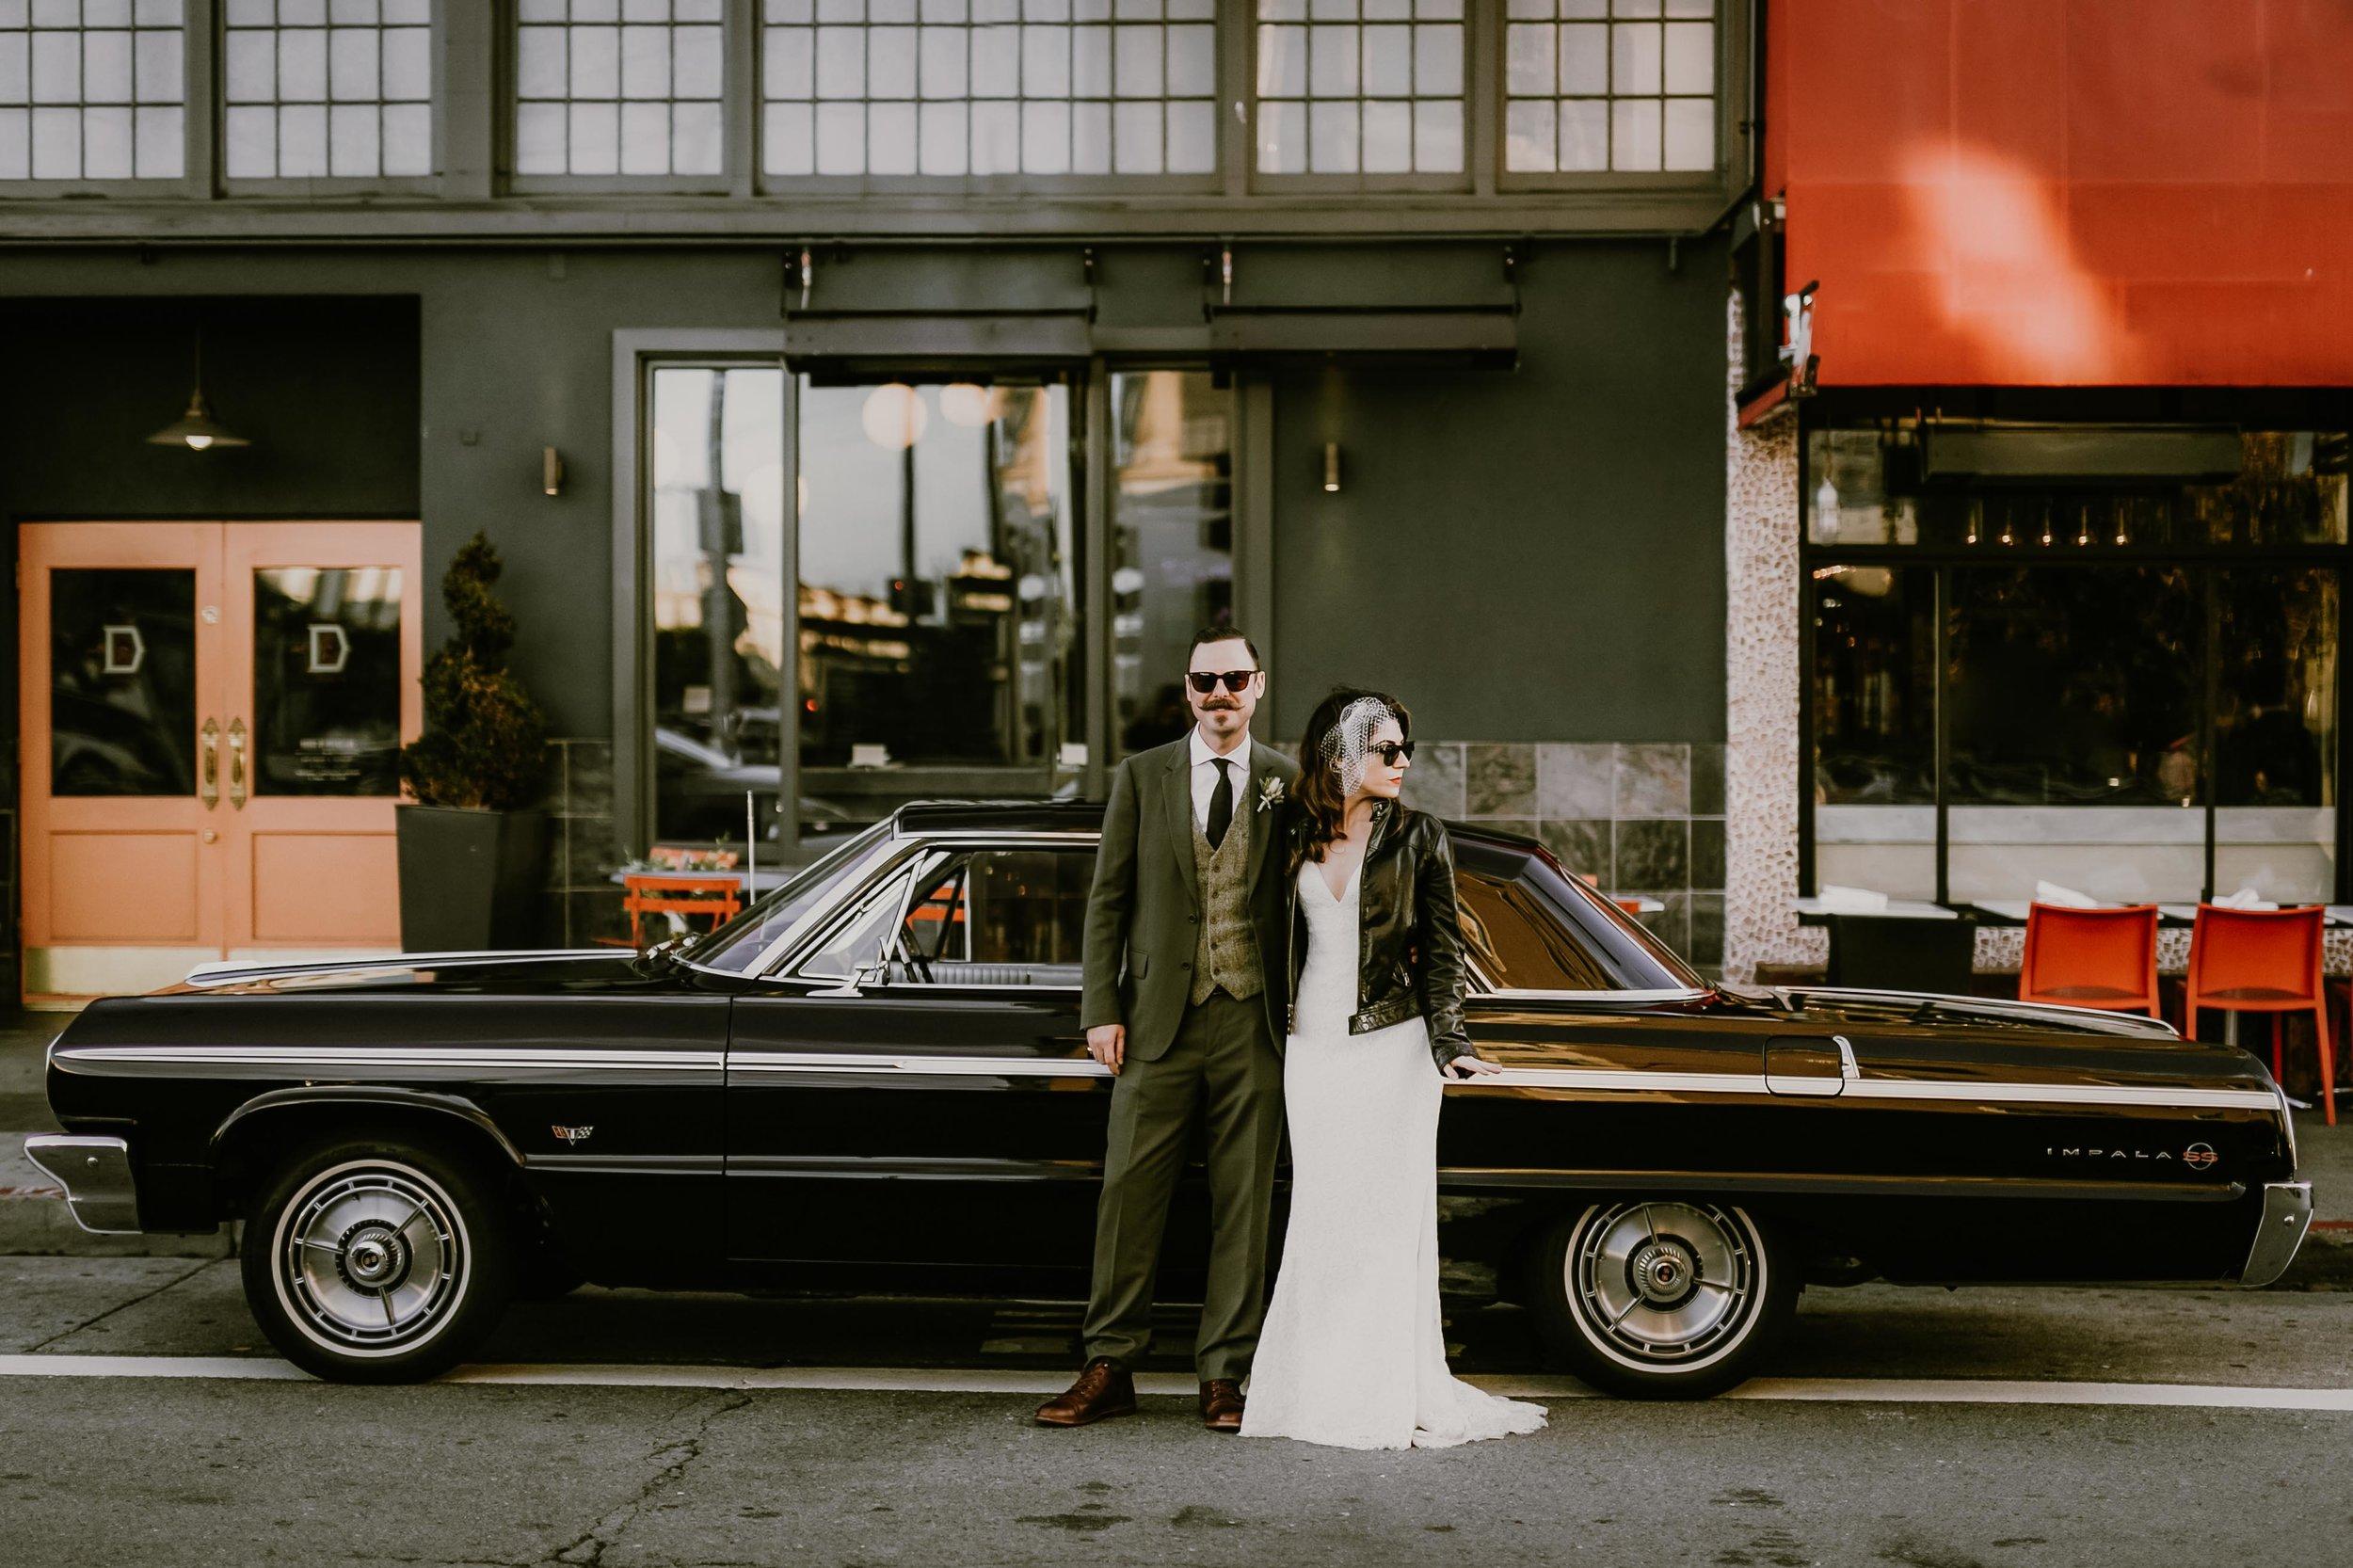 64' Impala Wedding in San Francisco    Sarah + Erik    View Post